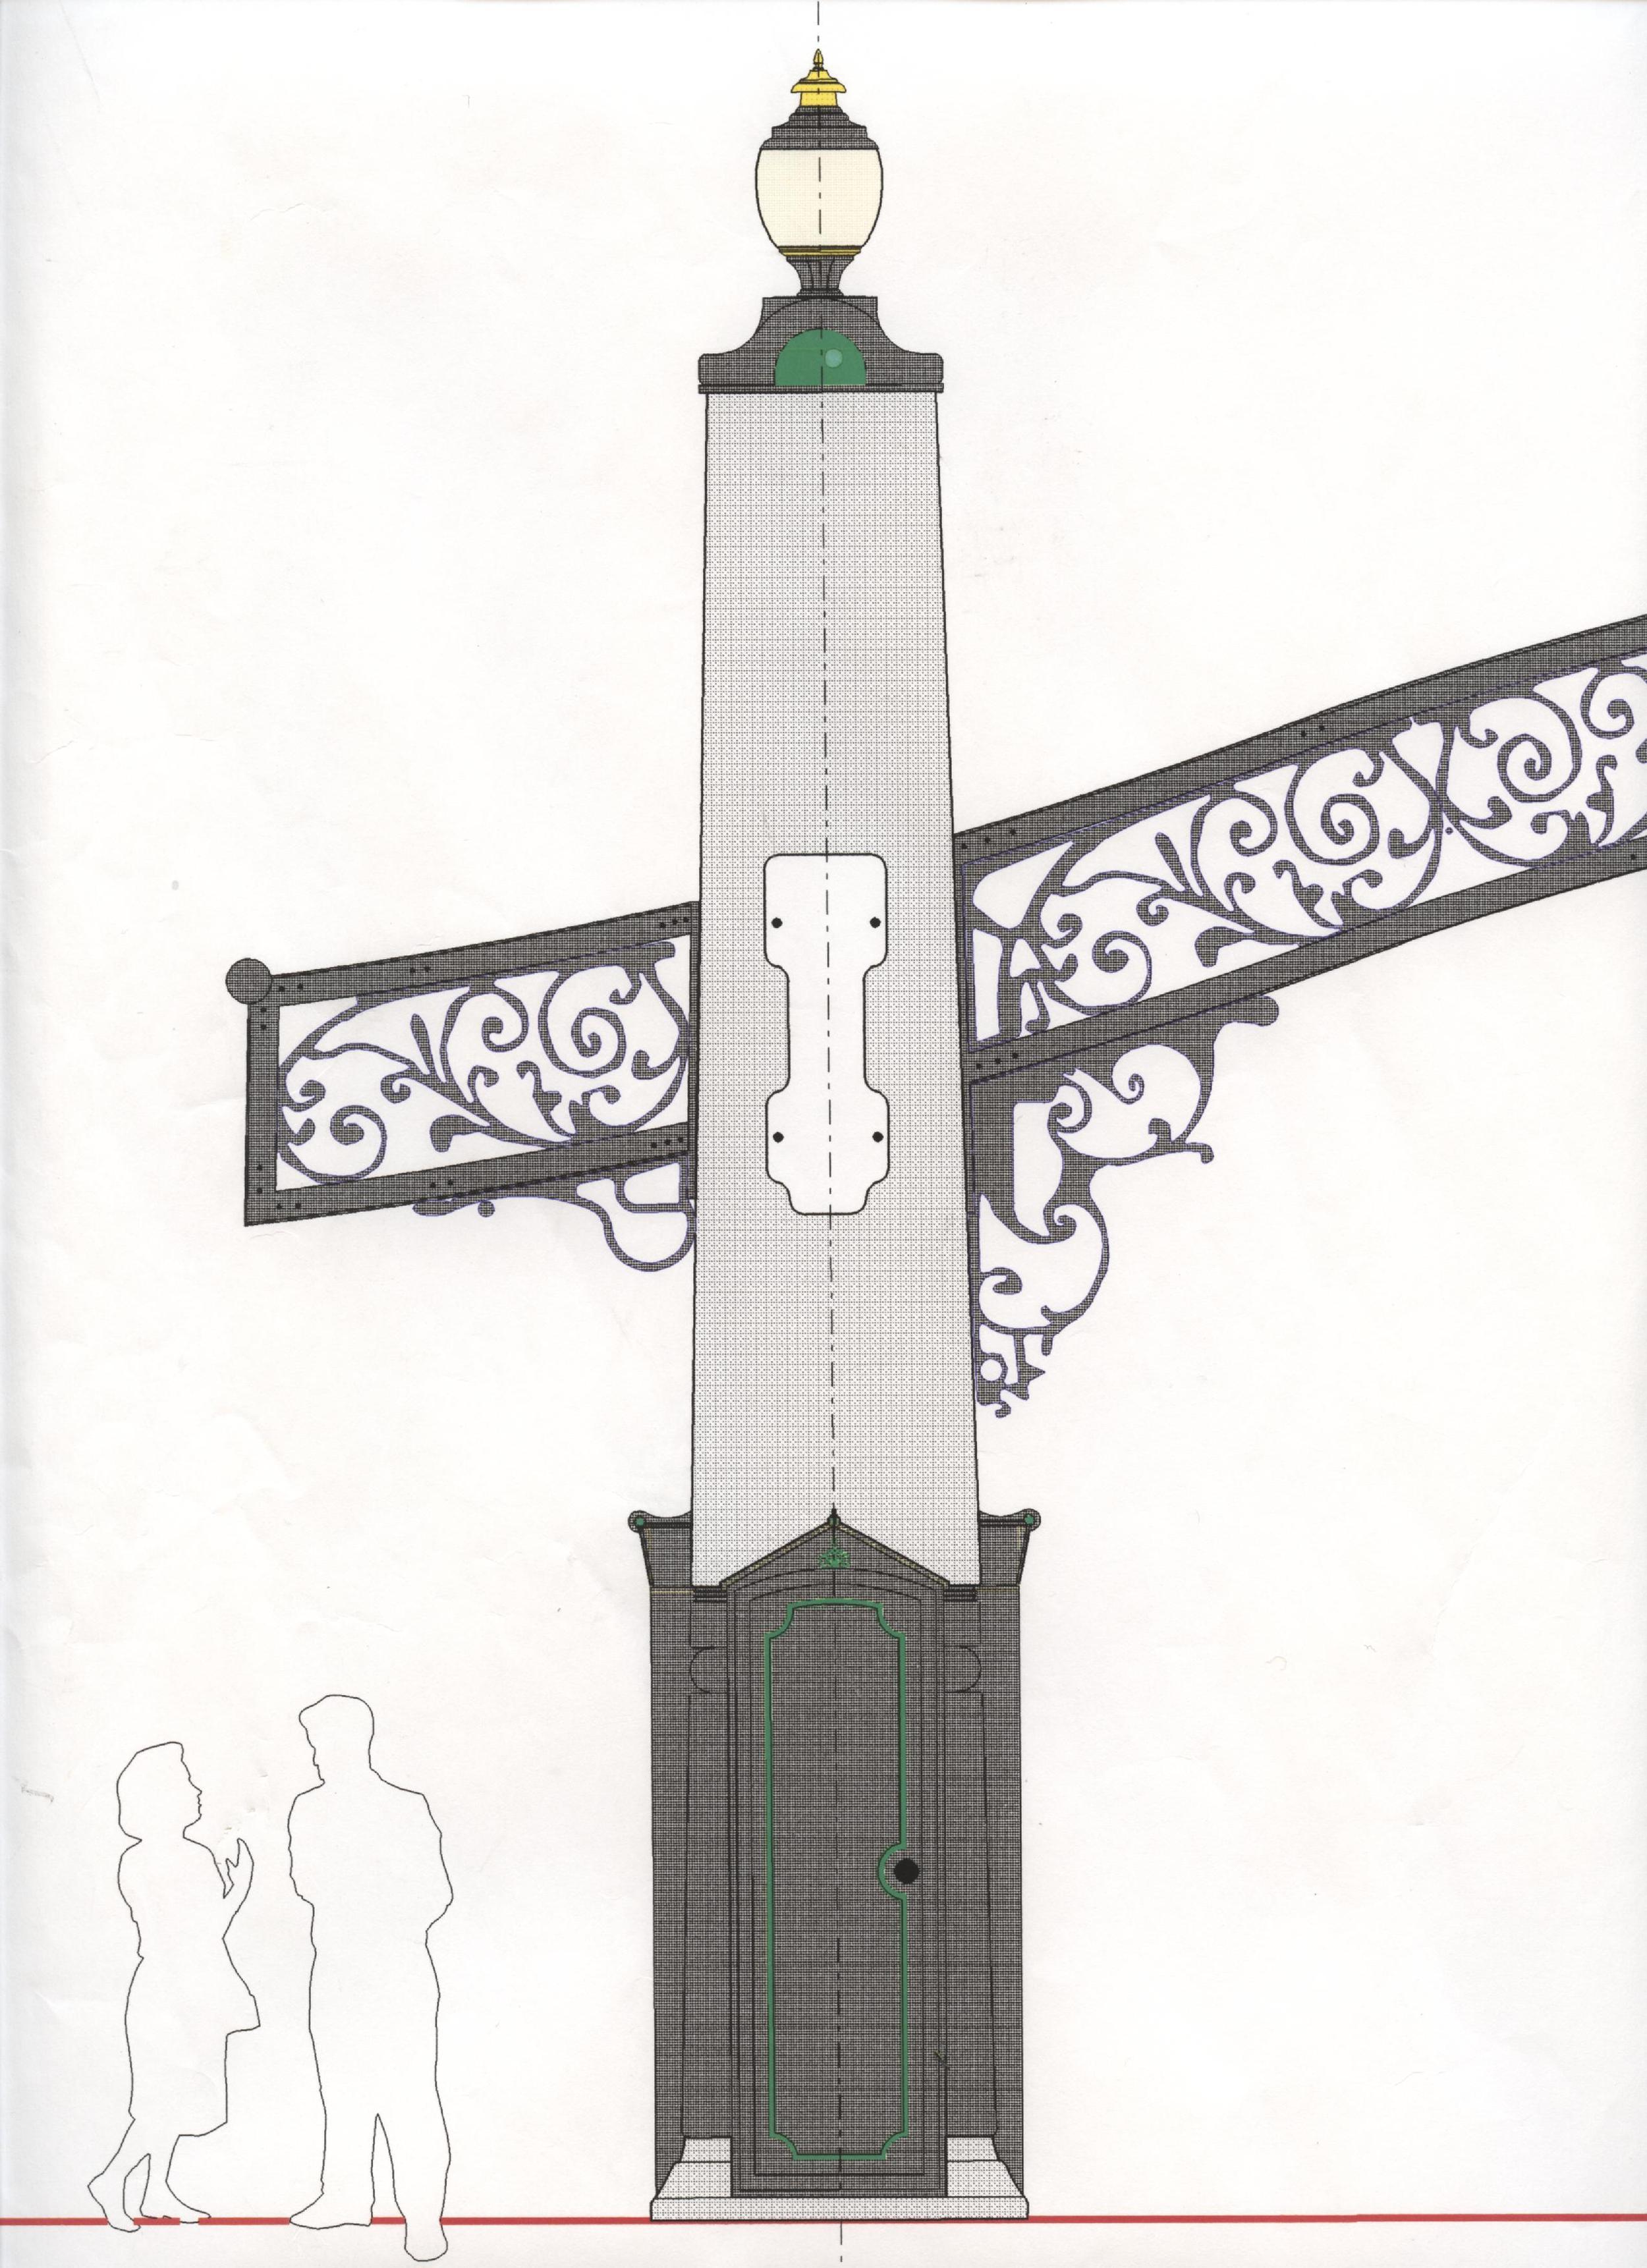 Hess Village Concept 003.jpg